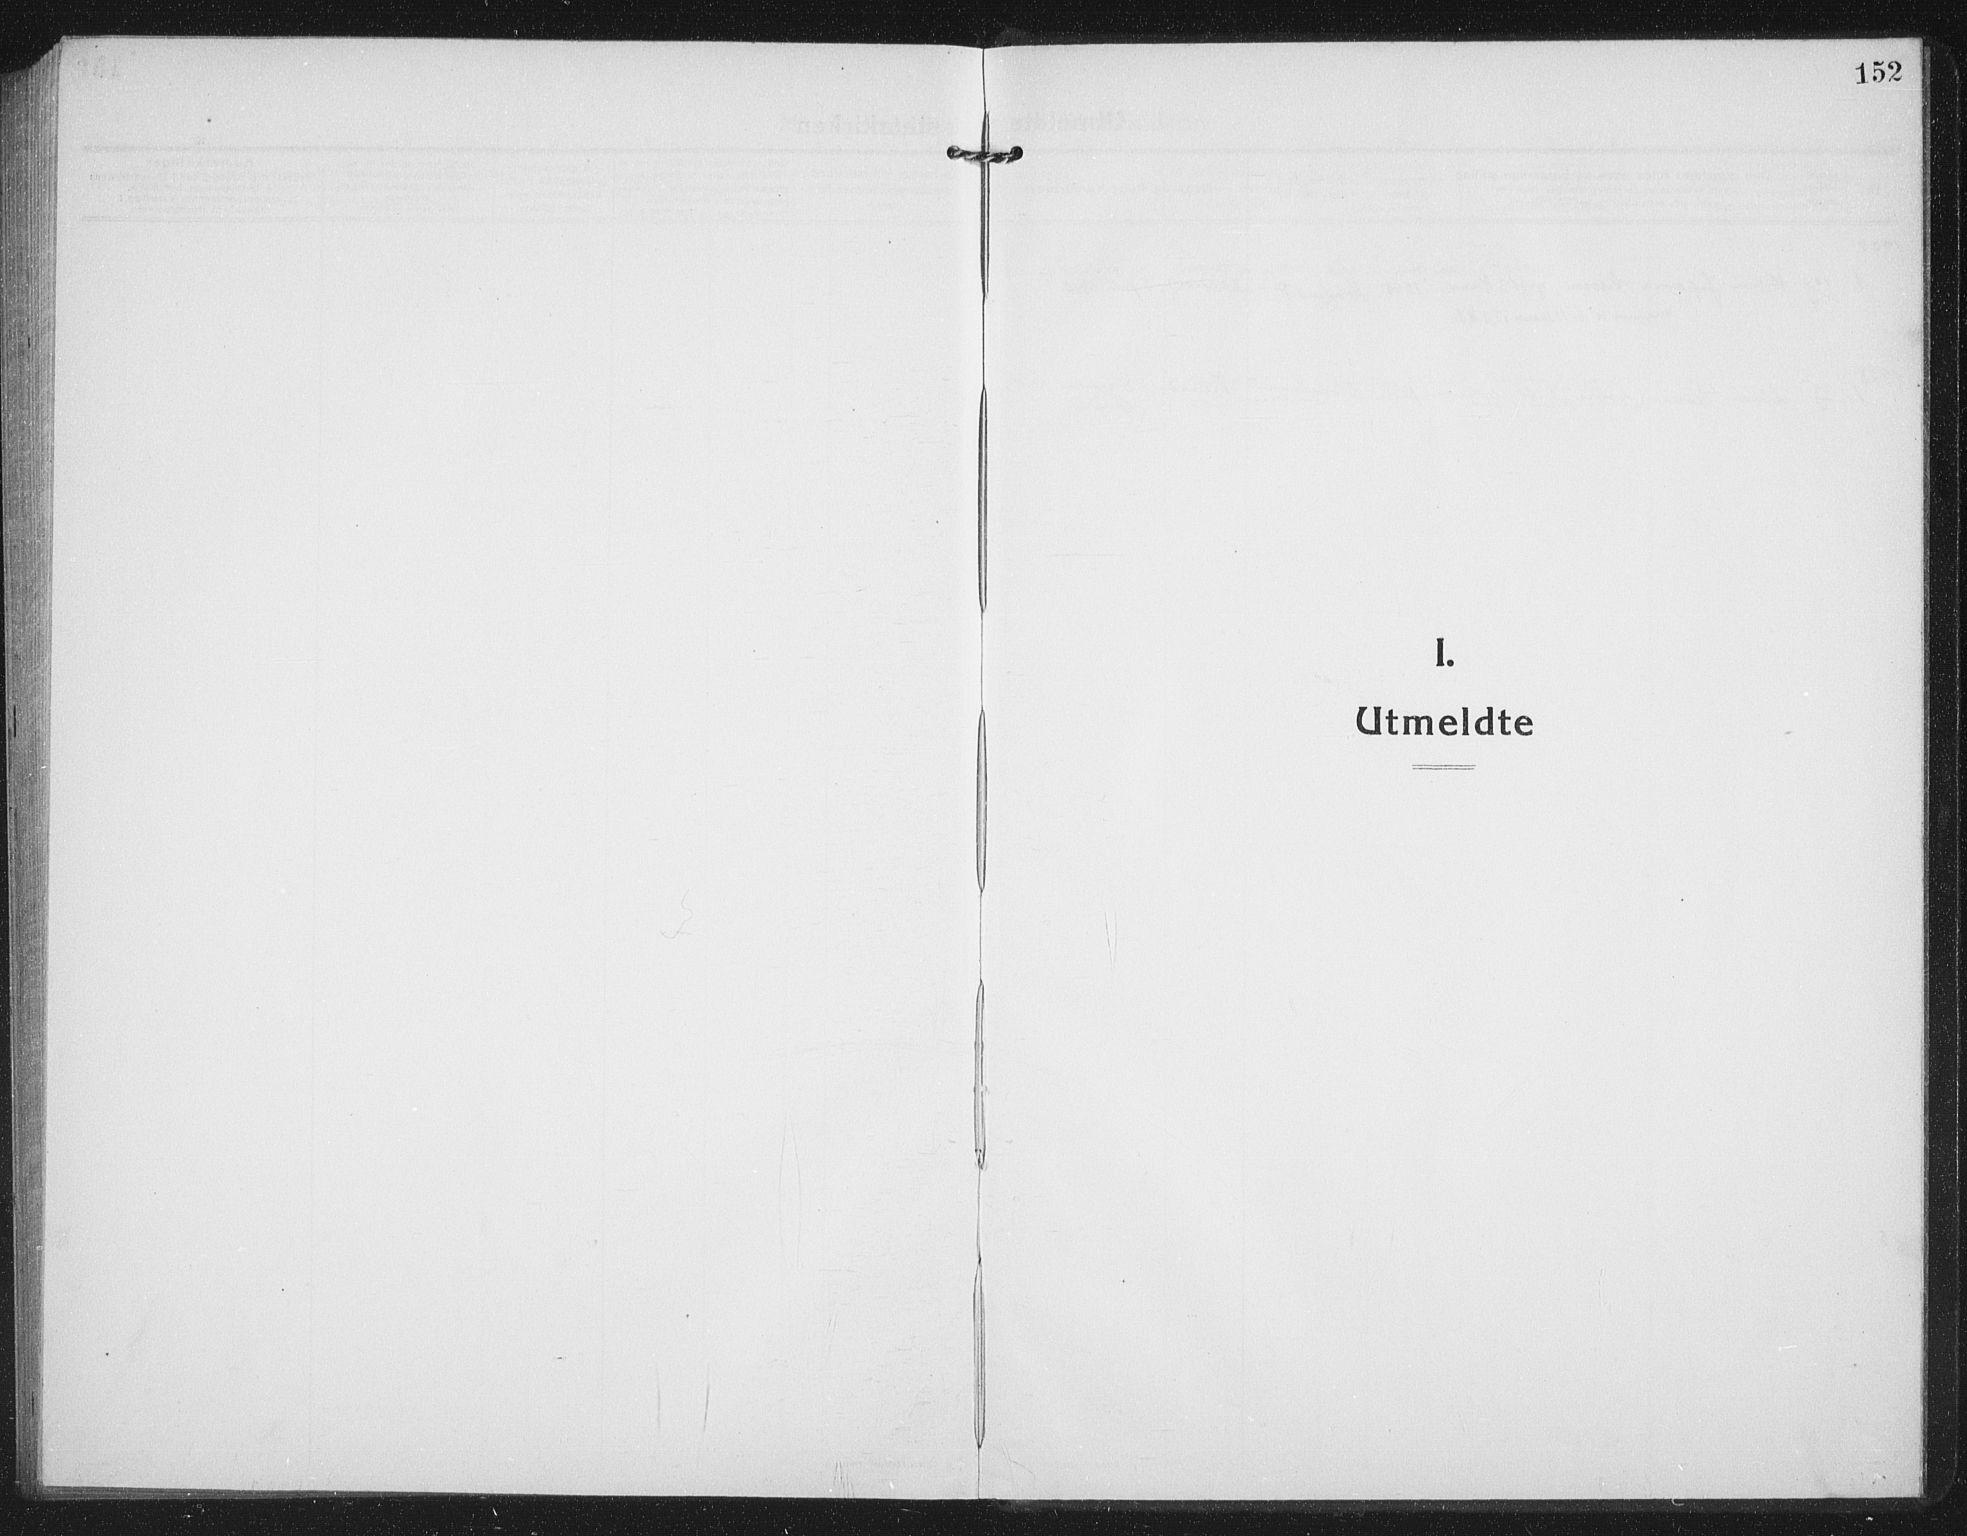 SATØ, Tranøy sokneprestkontor, I/Ia/Iab/L0019klokker: Klokkerbok nr. 19, 1914-1940, s. 152